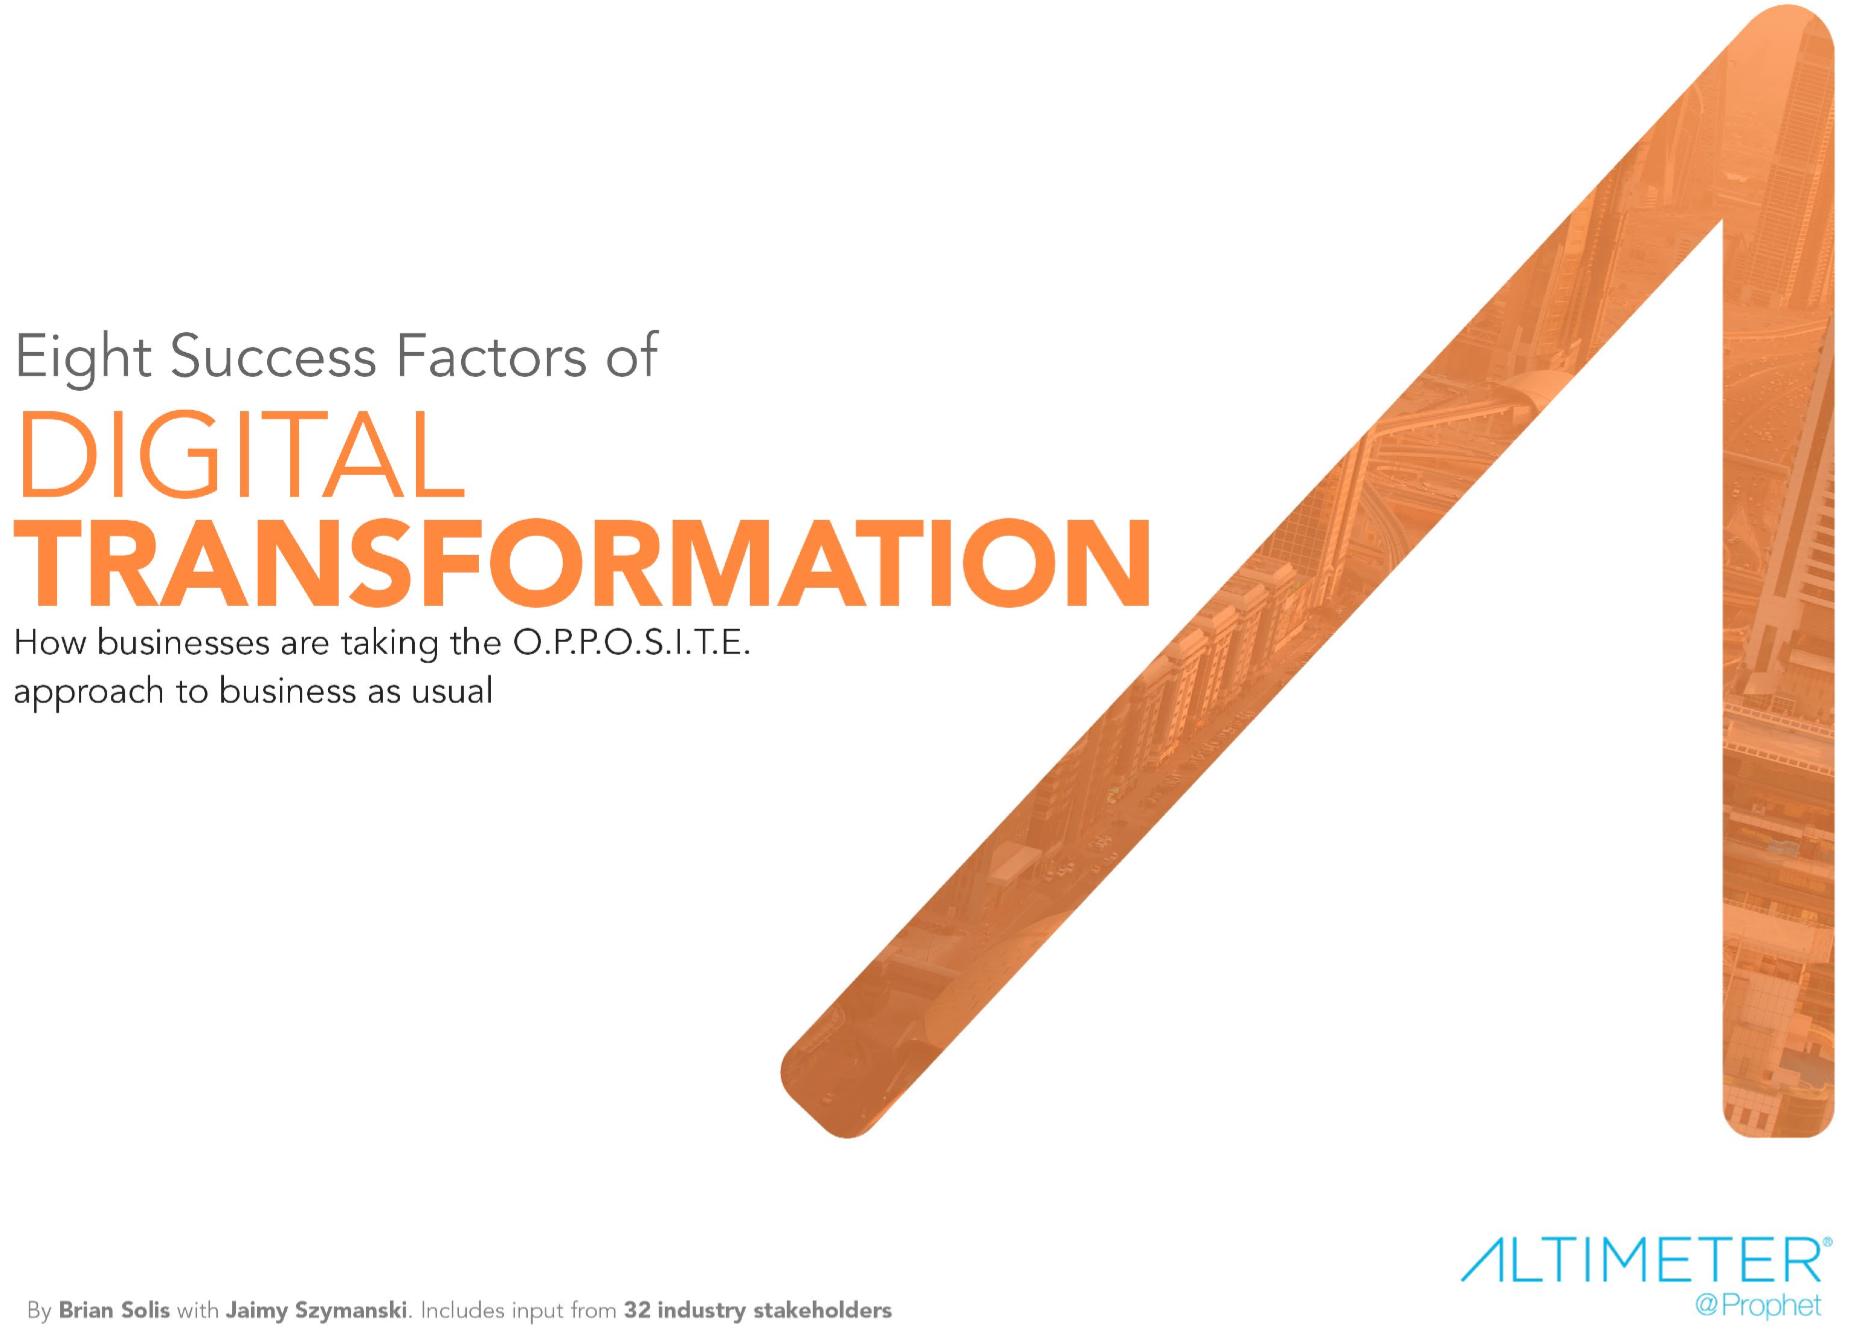 altimeter_data_report_-_eight_success_factors_final_pdf__page_1_of_15_